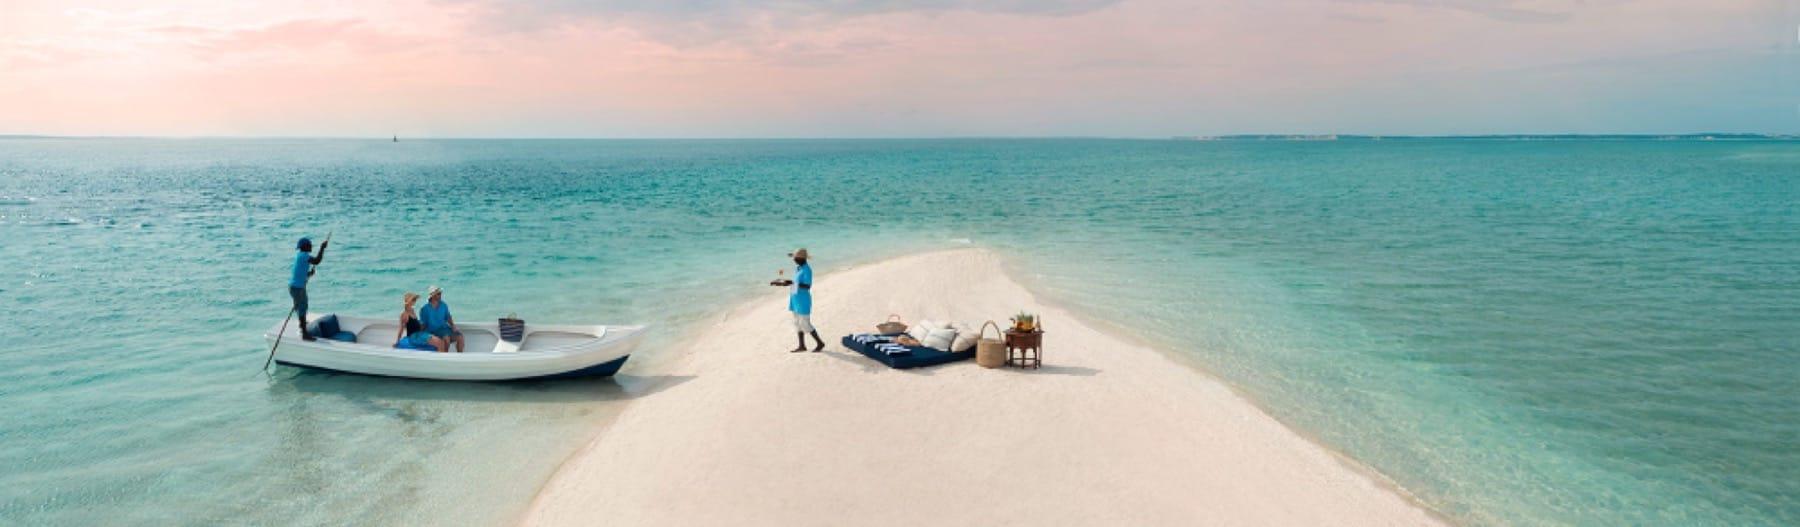 beach picnic bazaruto mozambique holiday